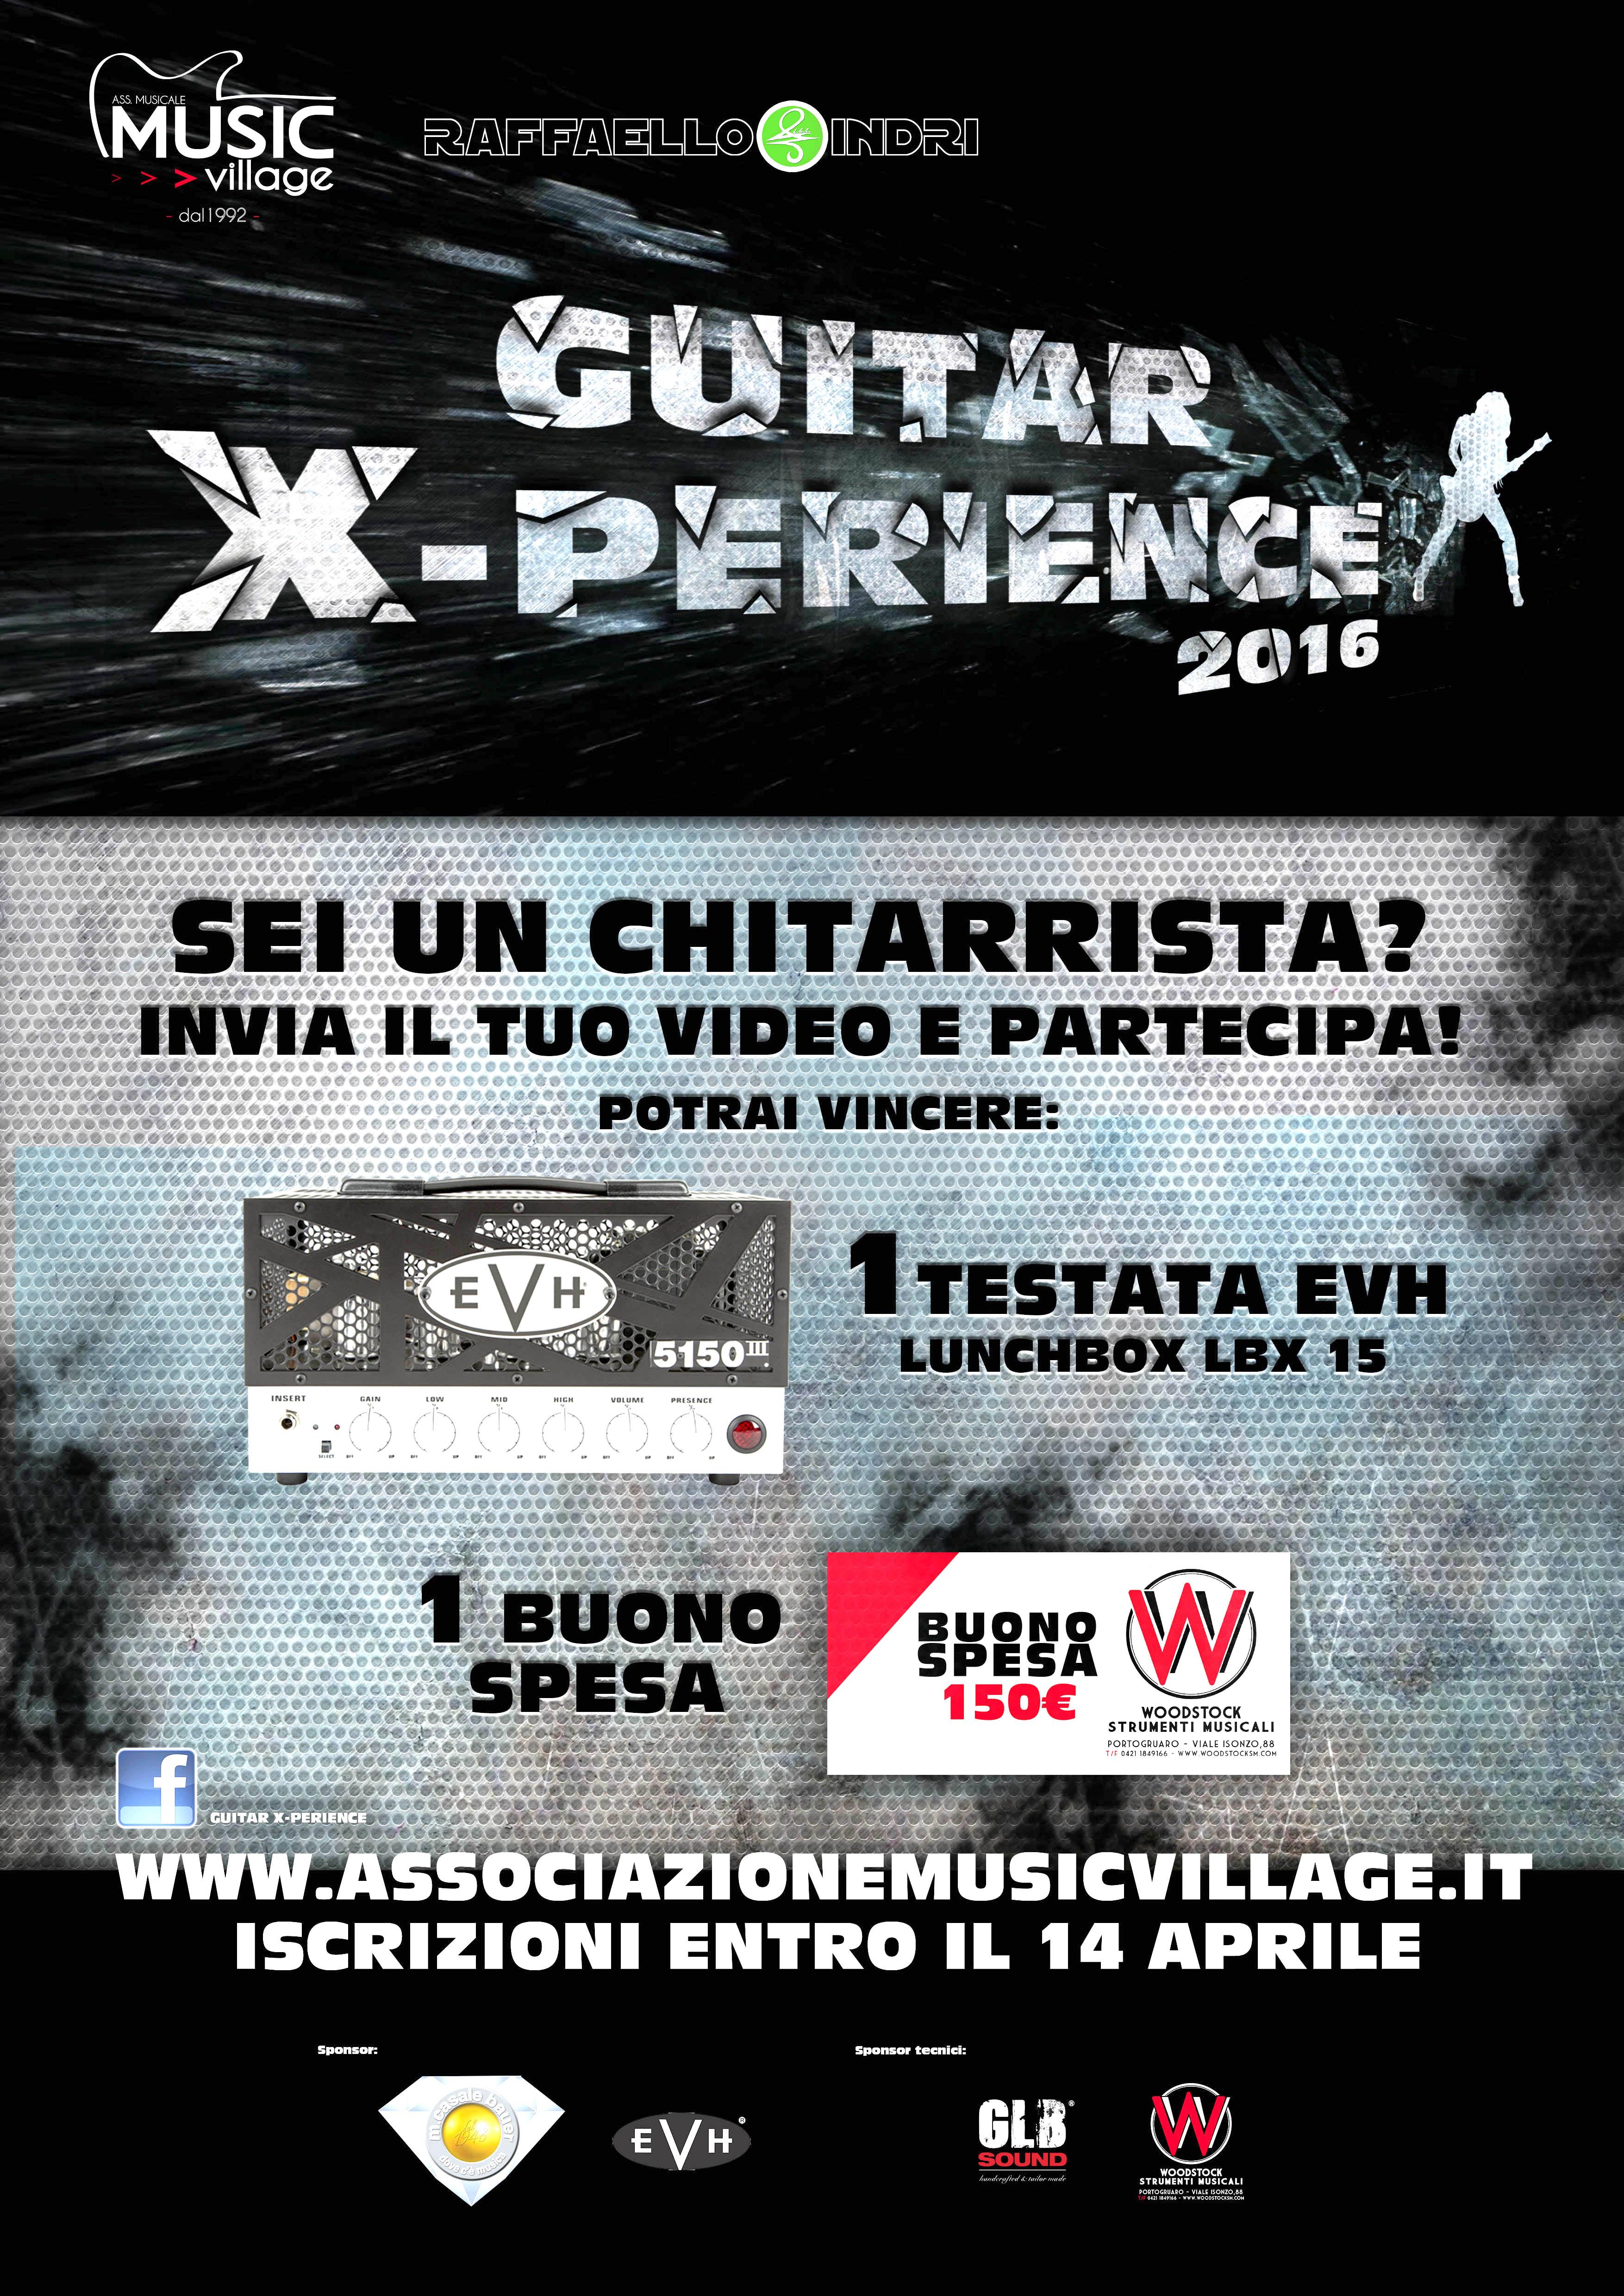 GUITAR X-PERIENCE 2016